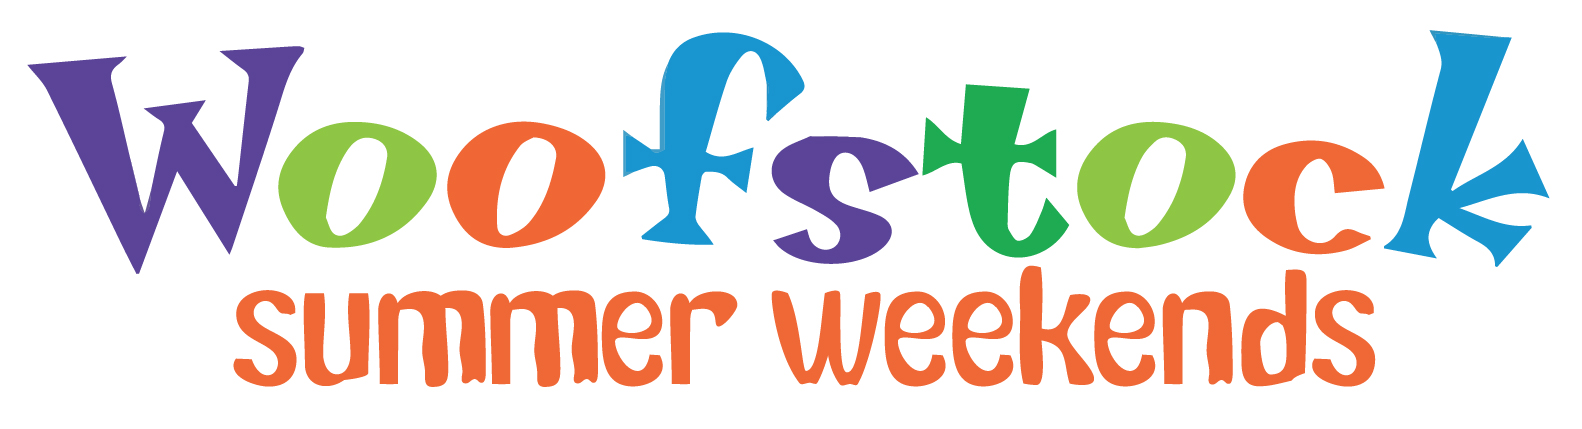 Woofstock Summer Weekends Logo